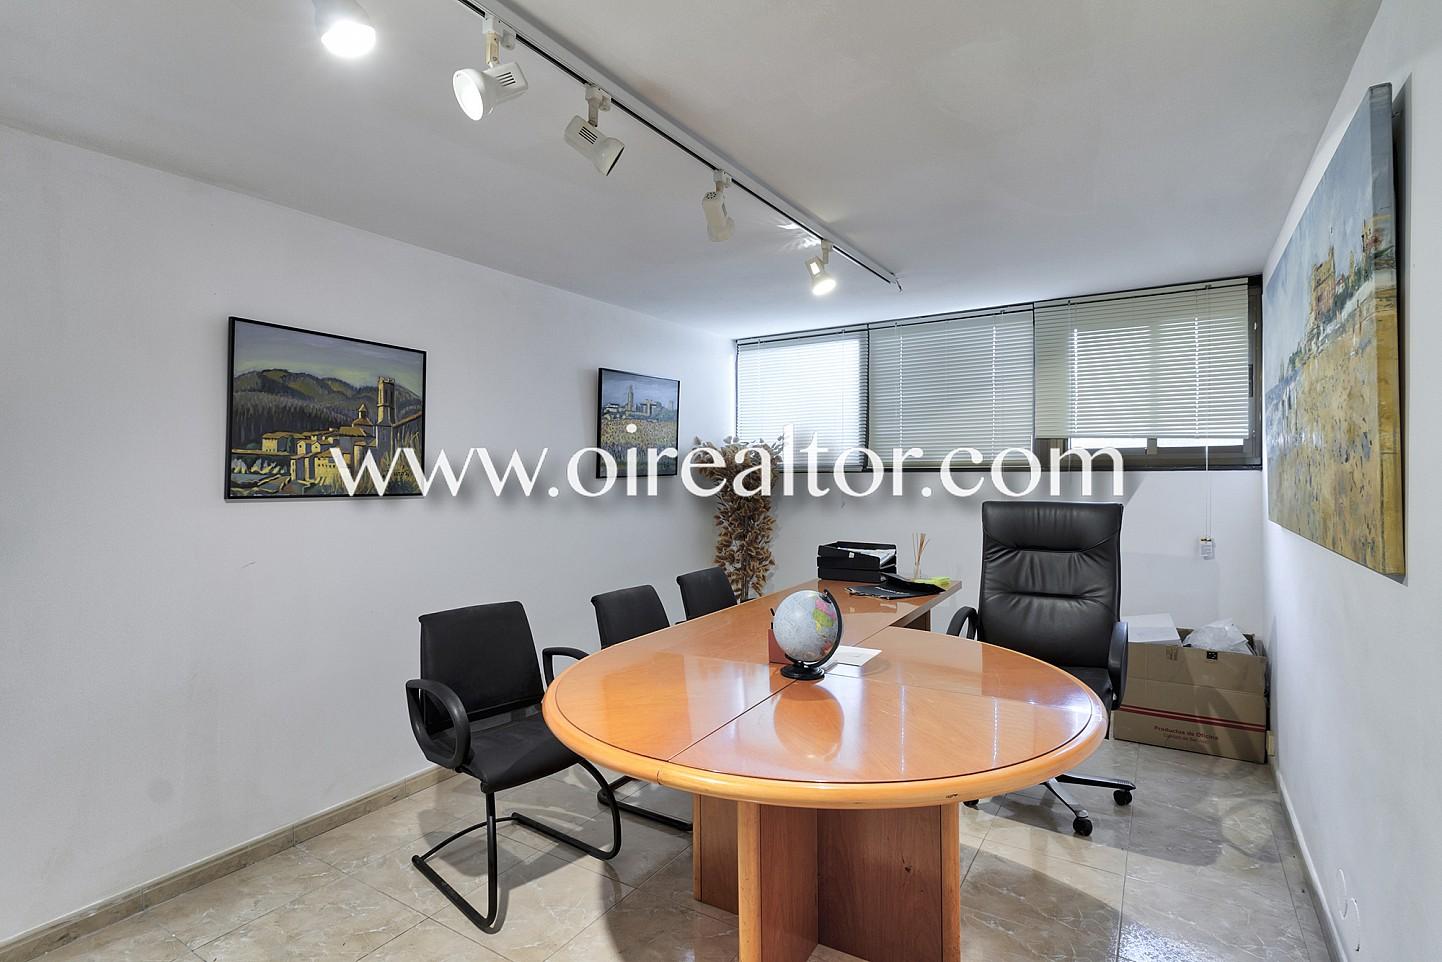 Magn ficas oficinas junto al real club de tenis barcelona for Oficinas de fecsa endesa en barcelona